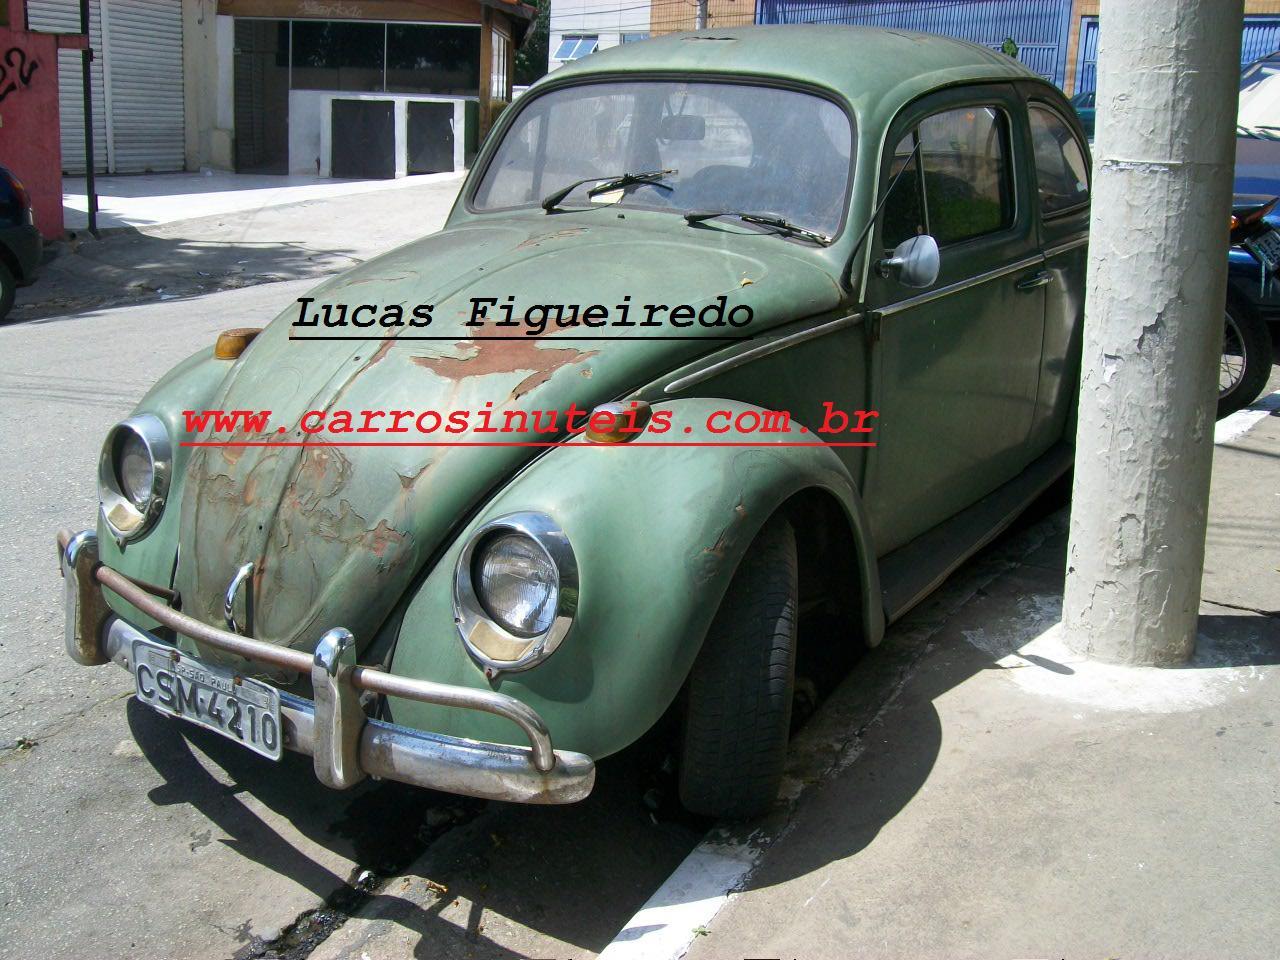 Lucas Fusca Sao Paulo Capital 25 Carros In 250 Teis